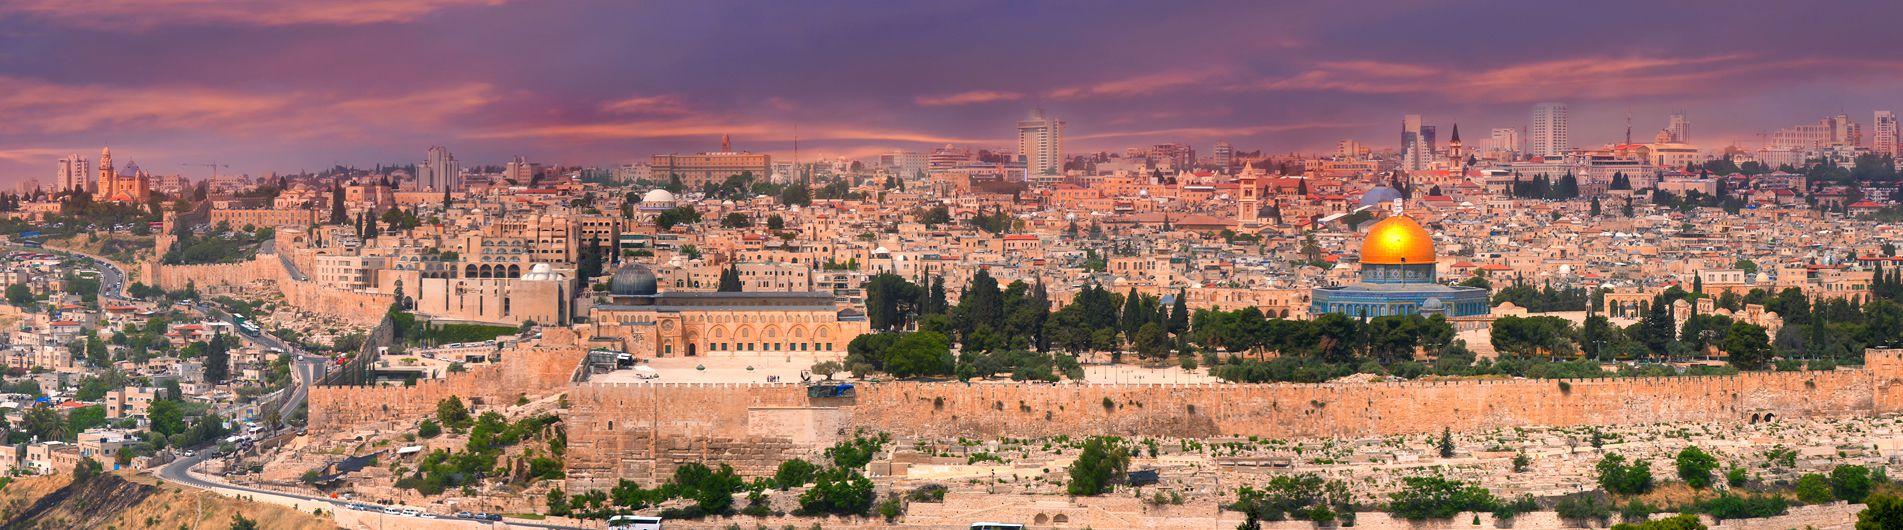 Jerusalem, Israel Holidays